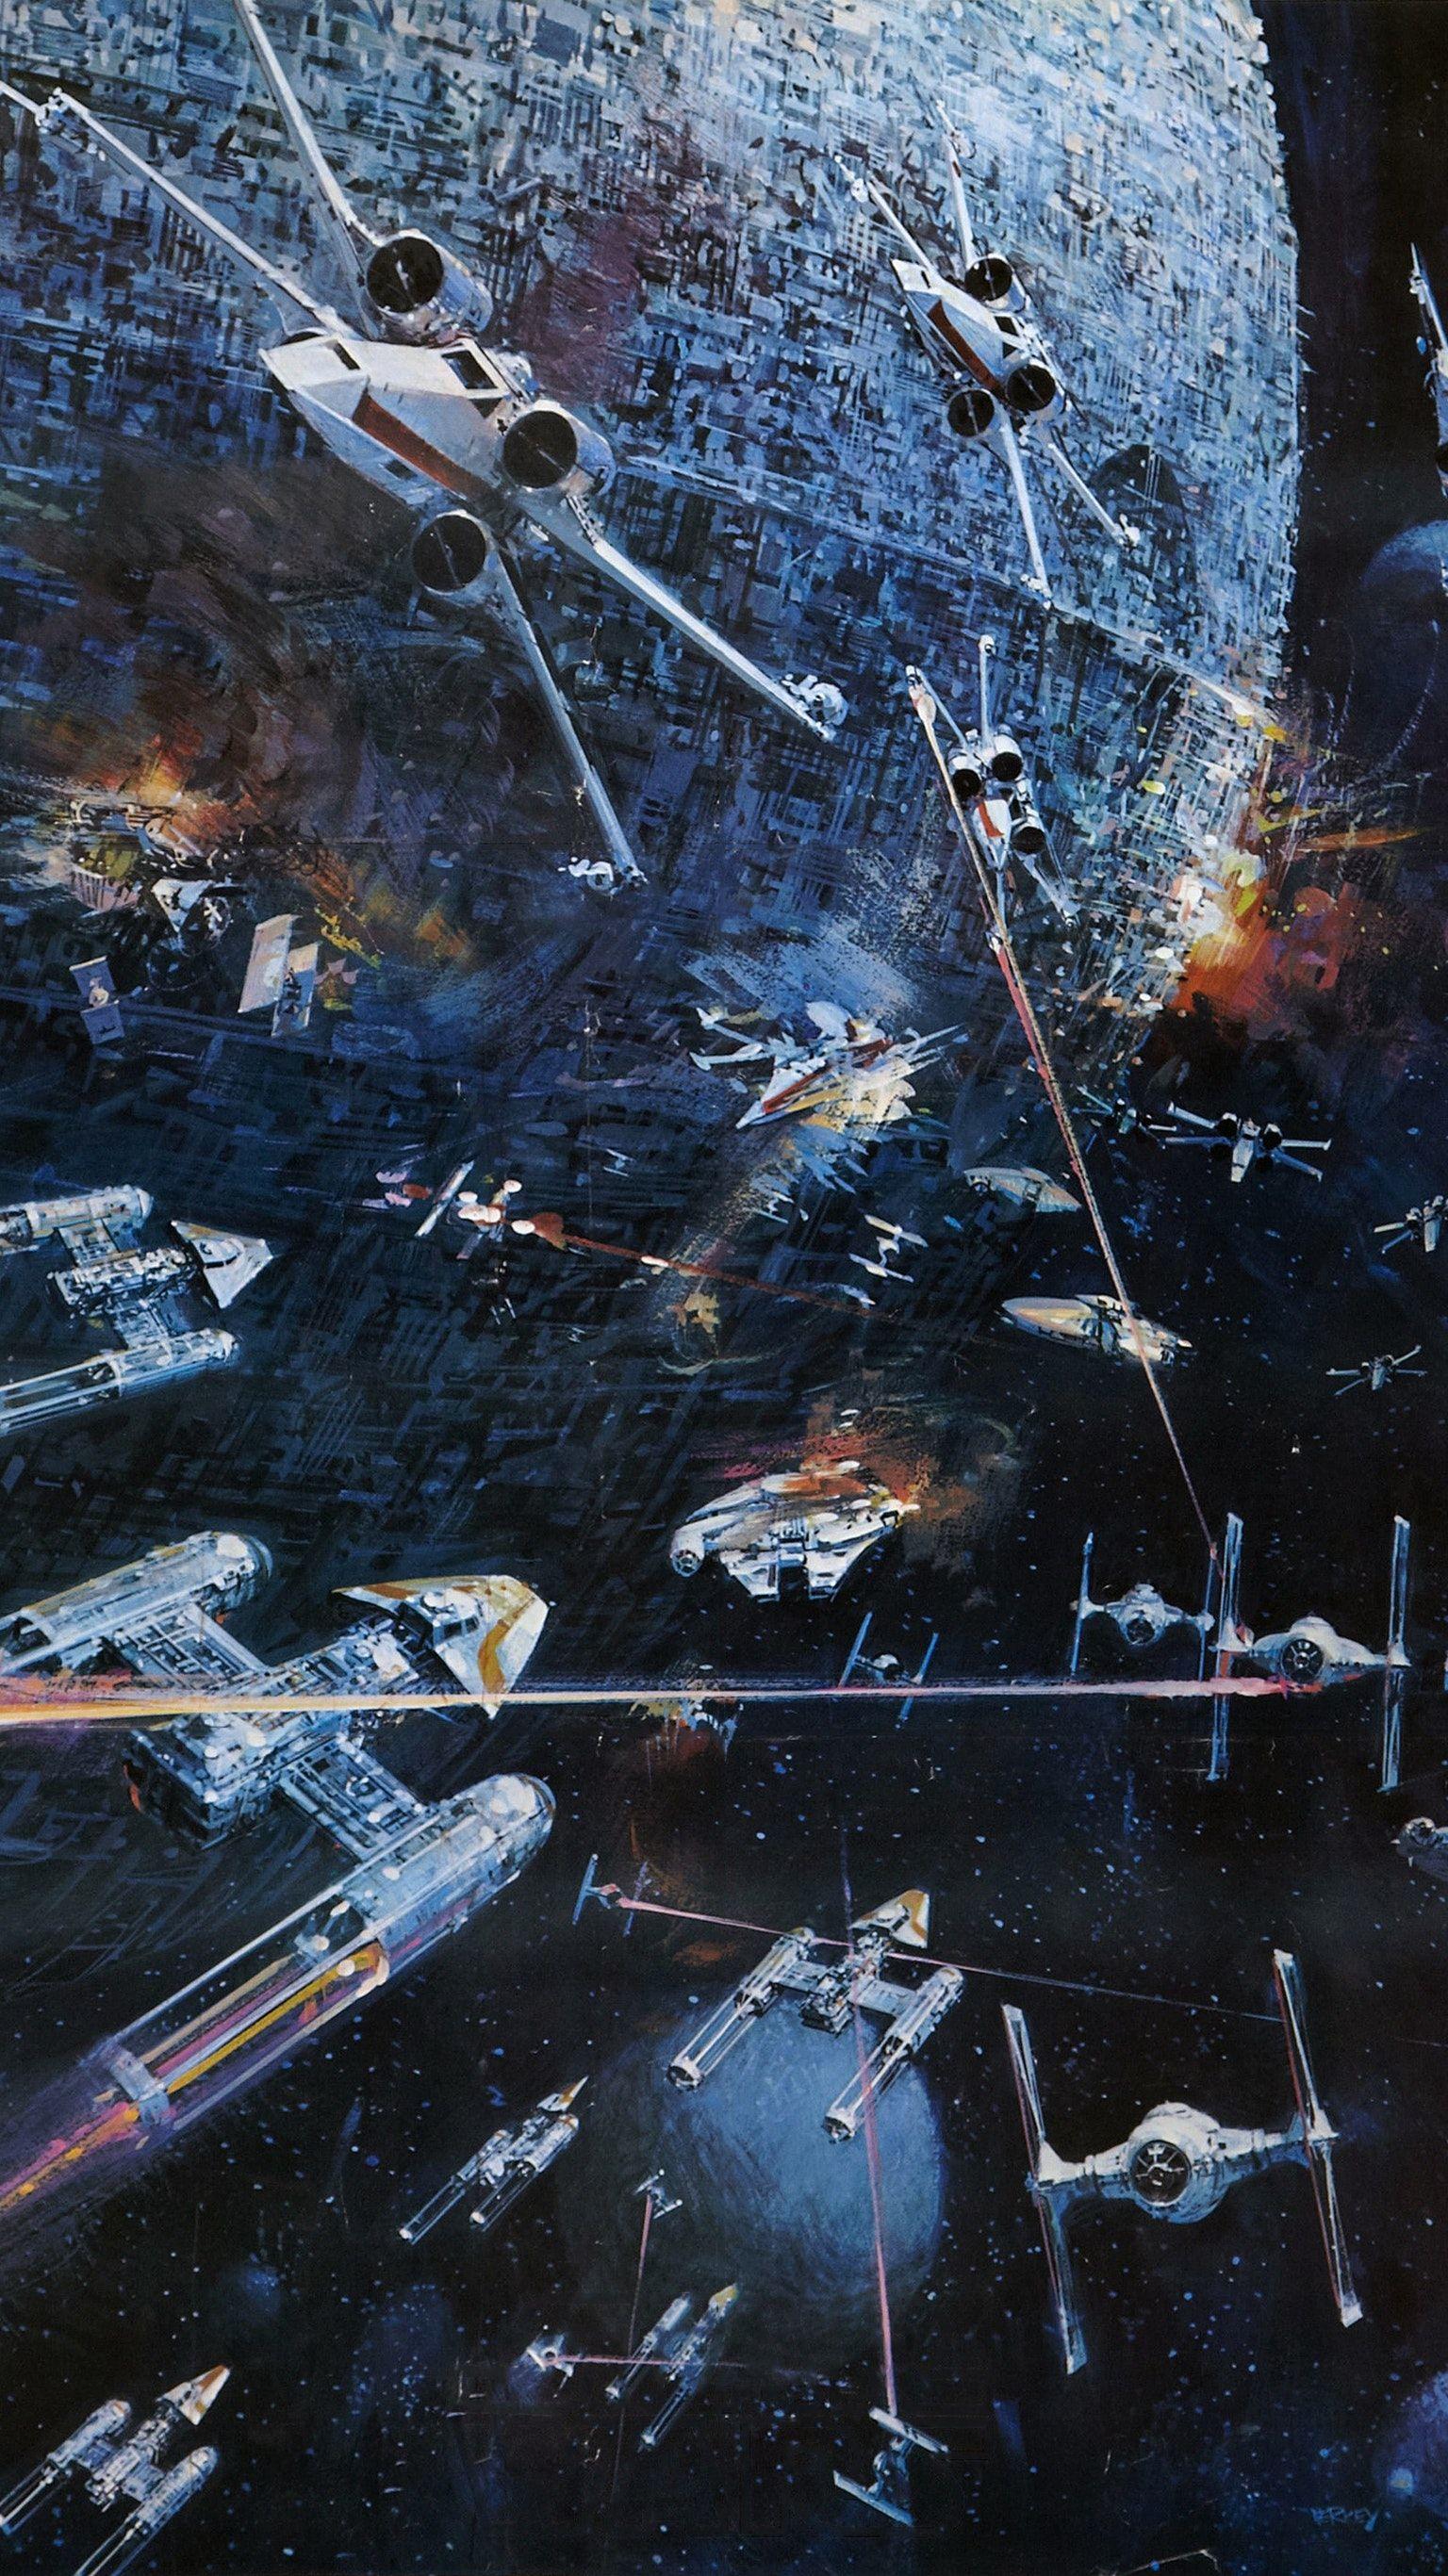 Star Wars 1977 Phone Wallpaper Moviemania Star Wars Poster Star Wars Artwork Star Wars Wallpaper